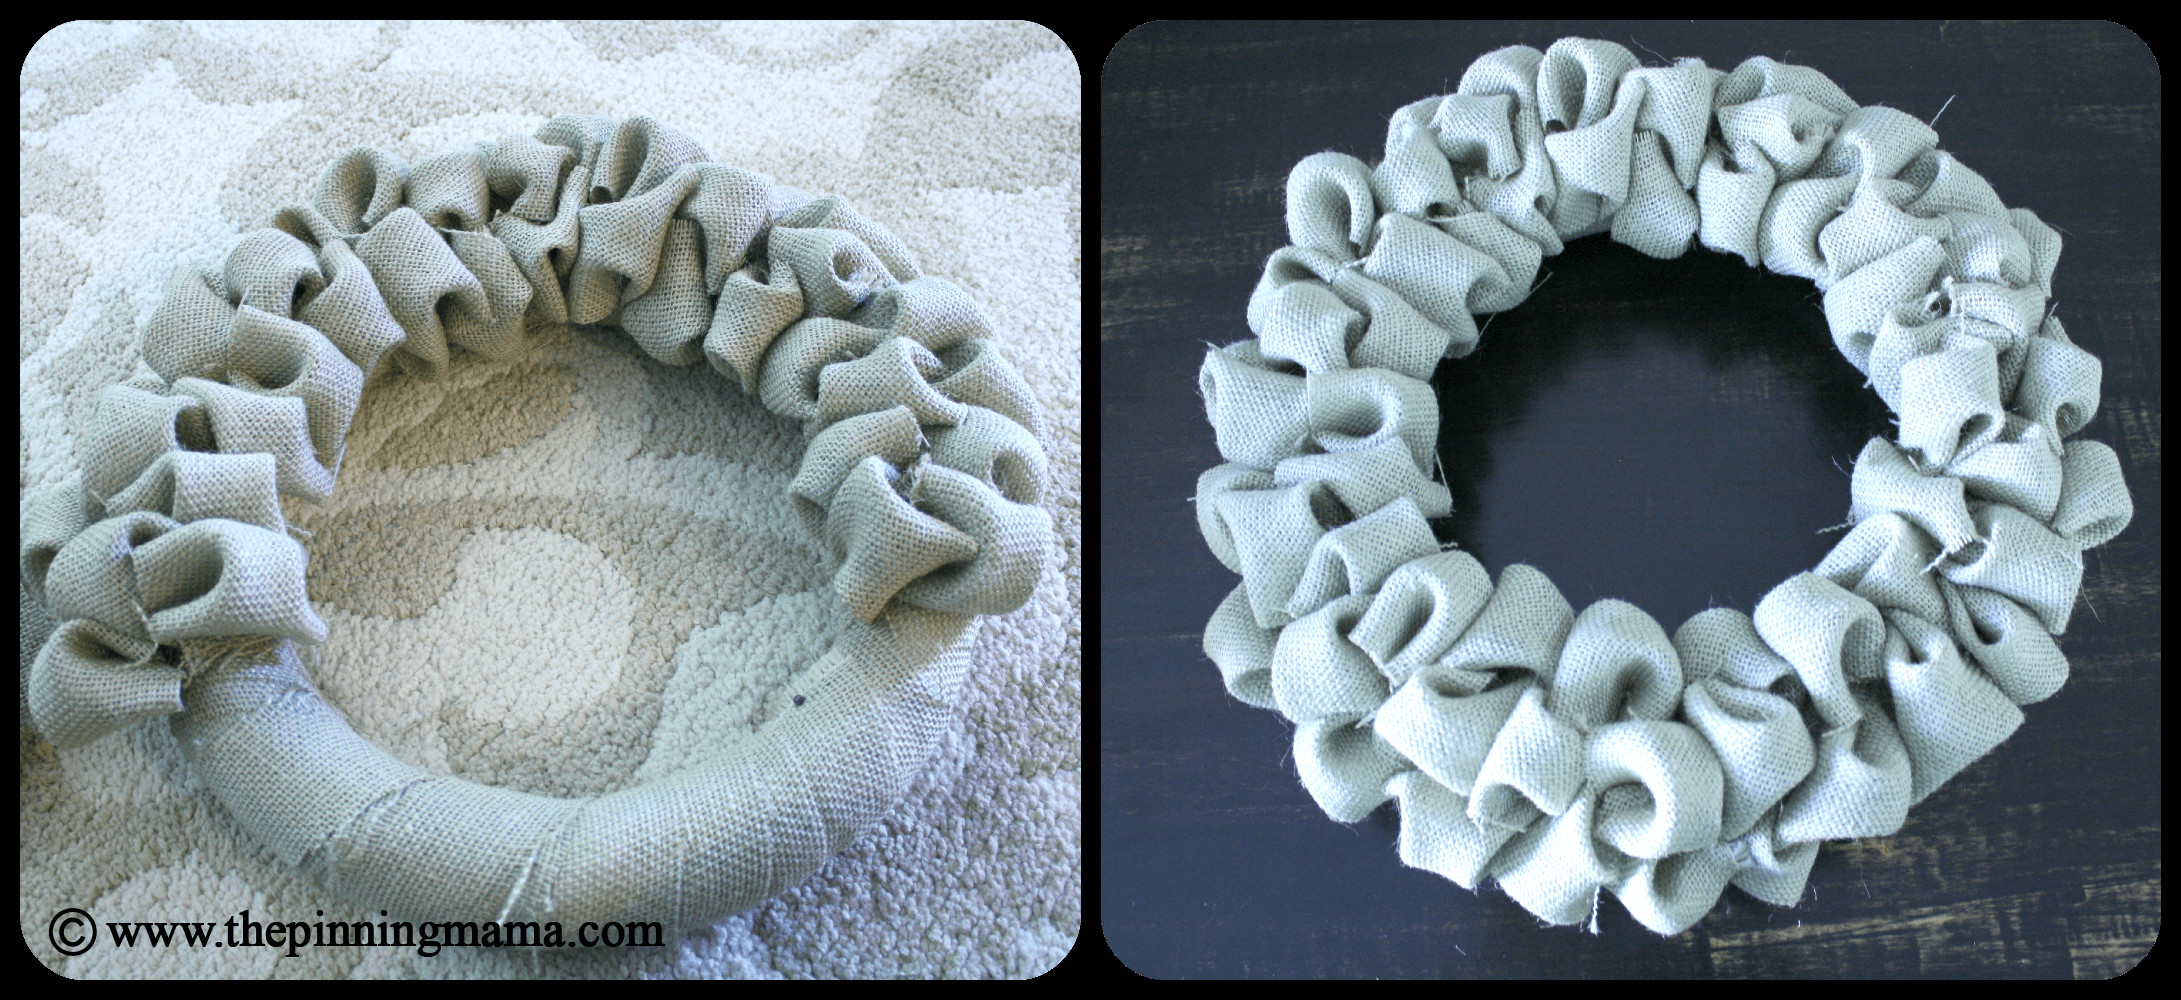 Best ideas about Burlap Wreath DIY . Save or Pin Pin Test DIY Burlap Bubble Wreath Now.